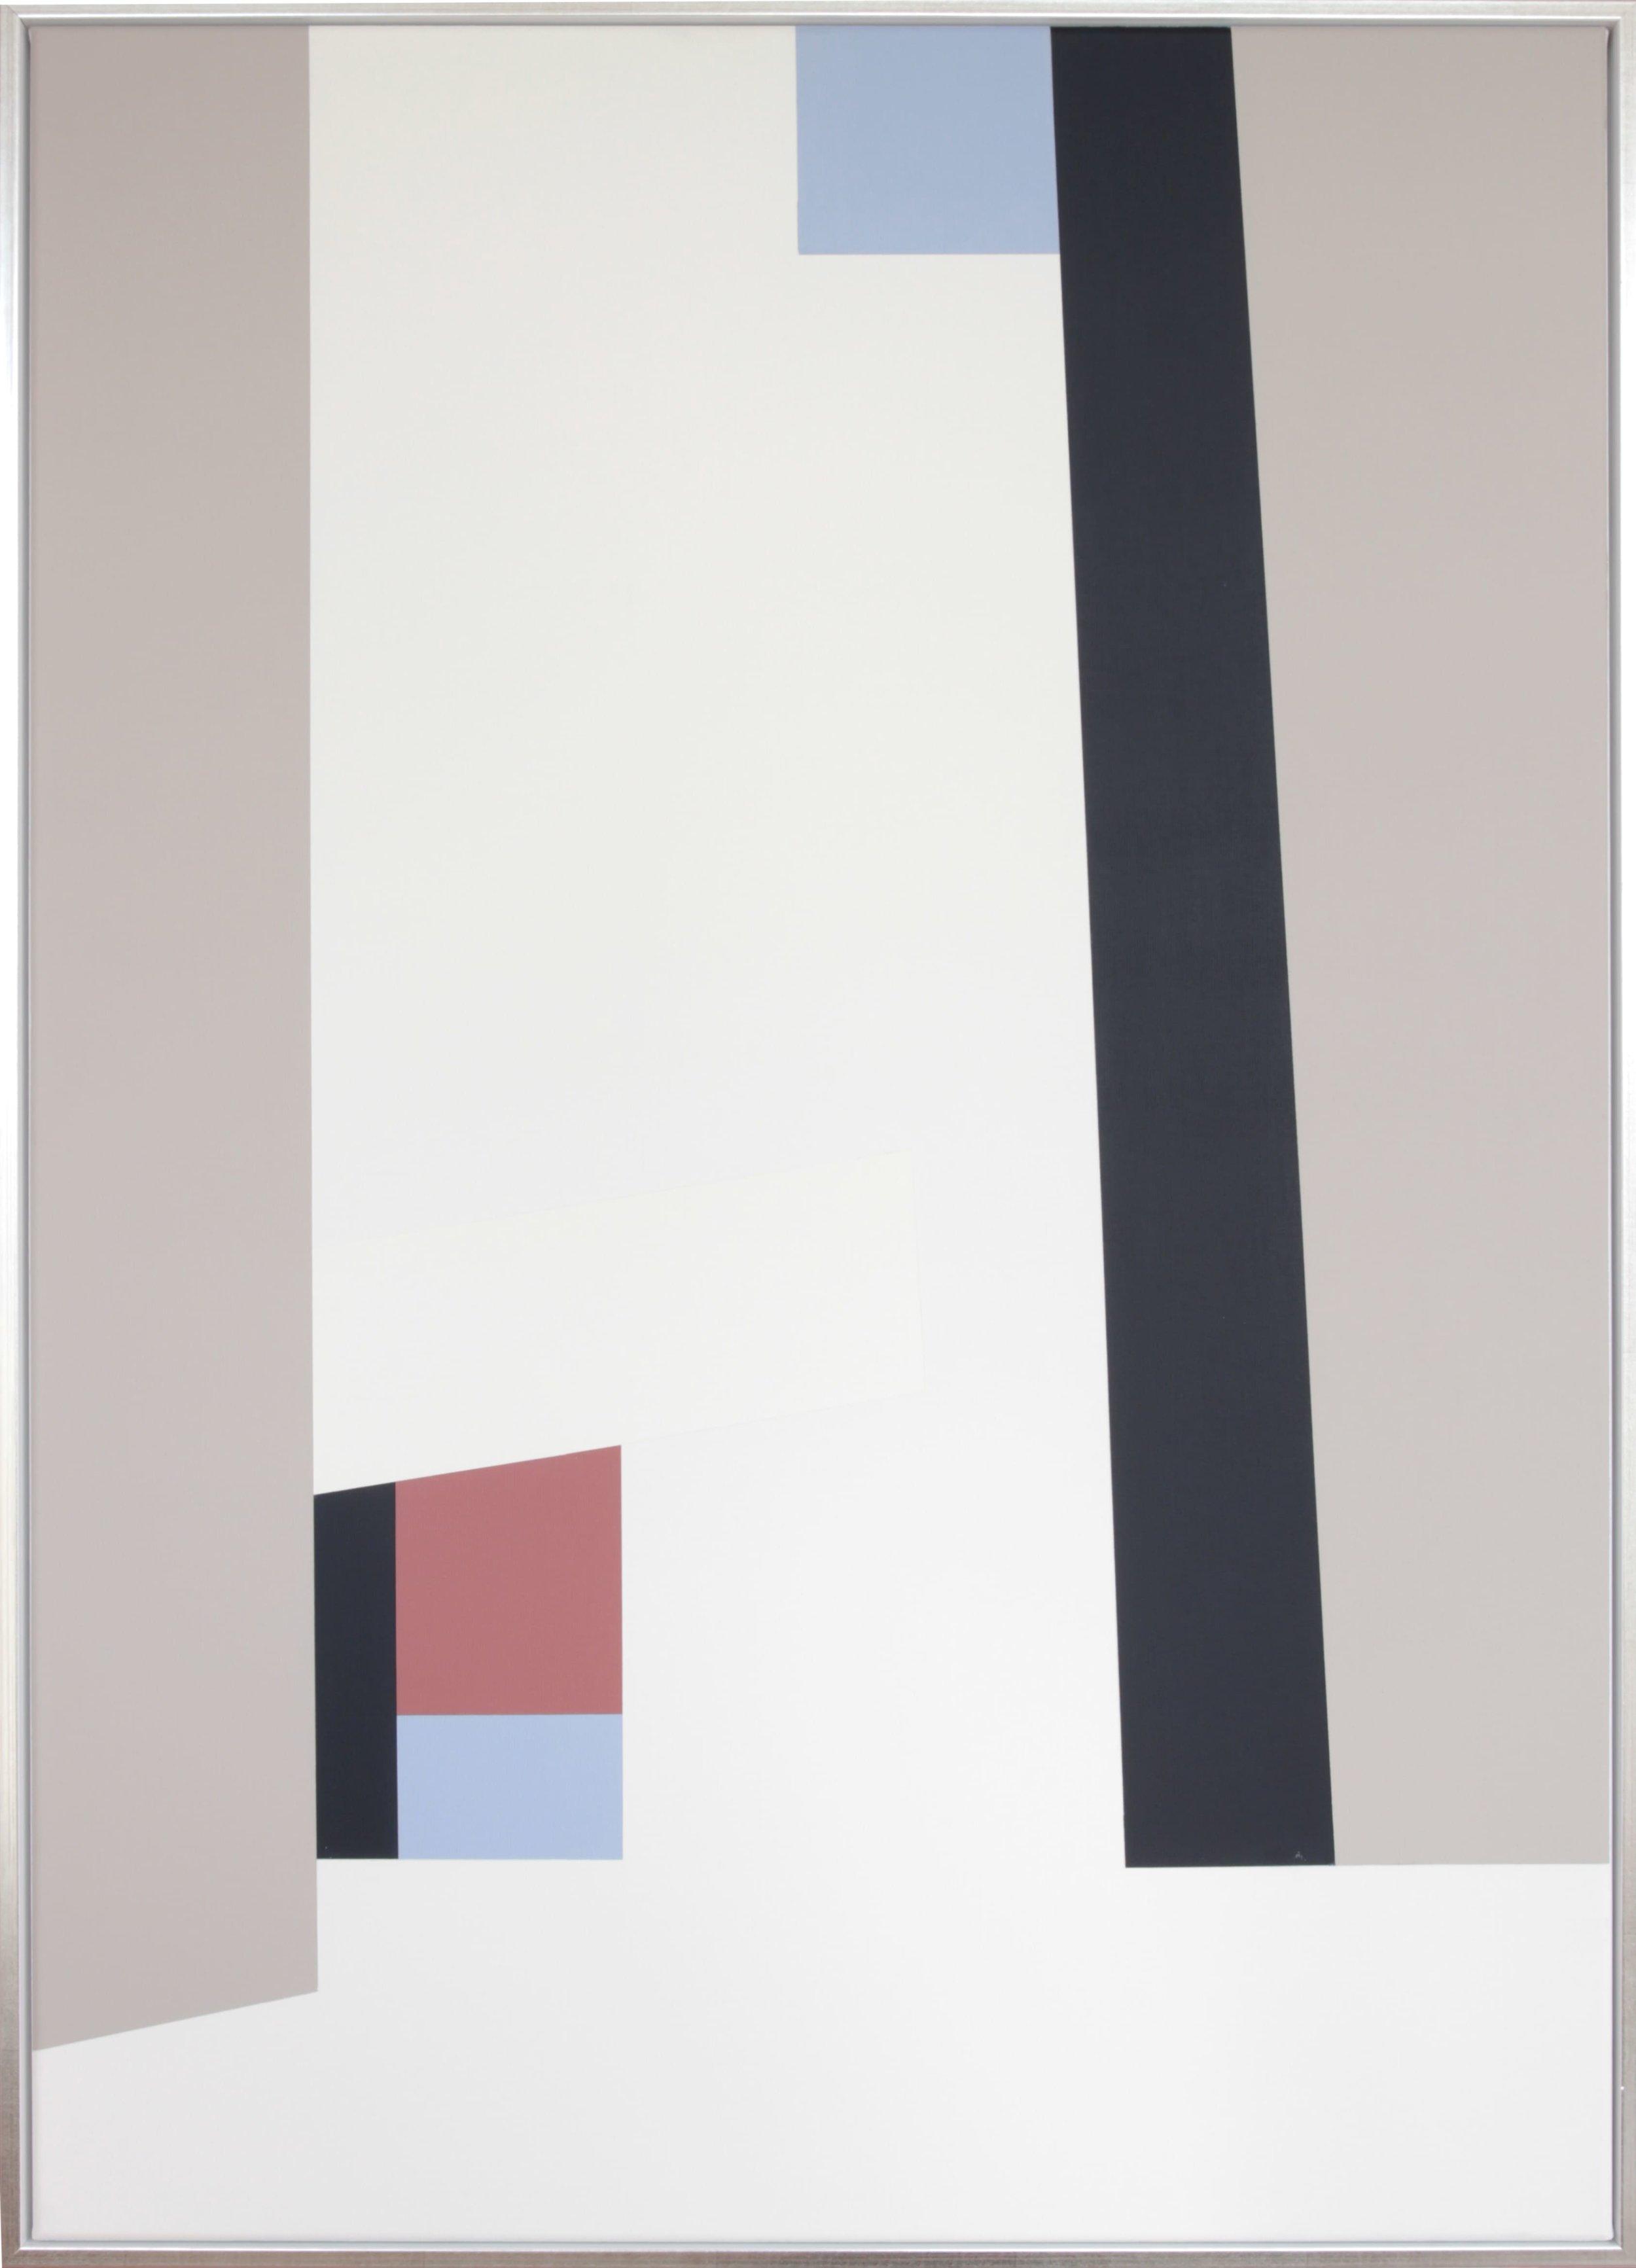 Simplicity Of Art S14, Acrylic on Canvas, 2019